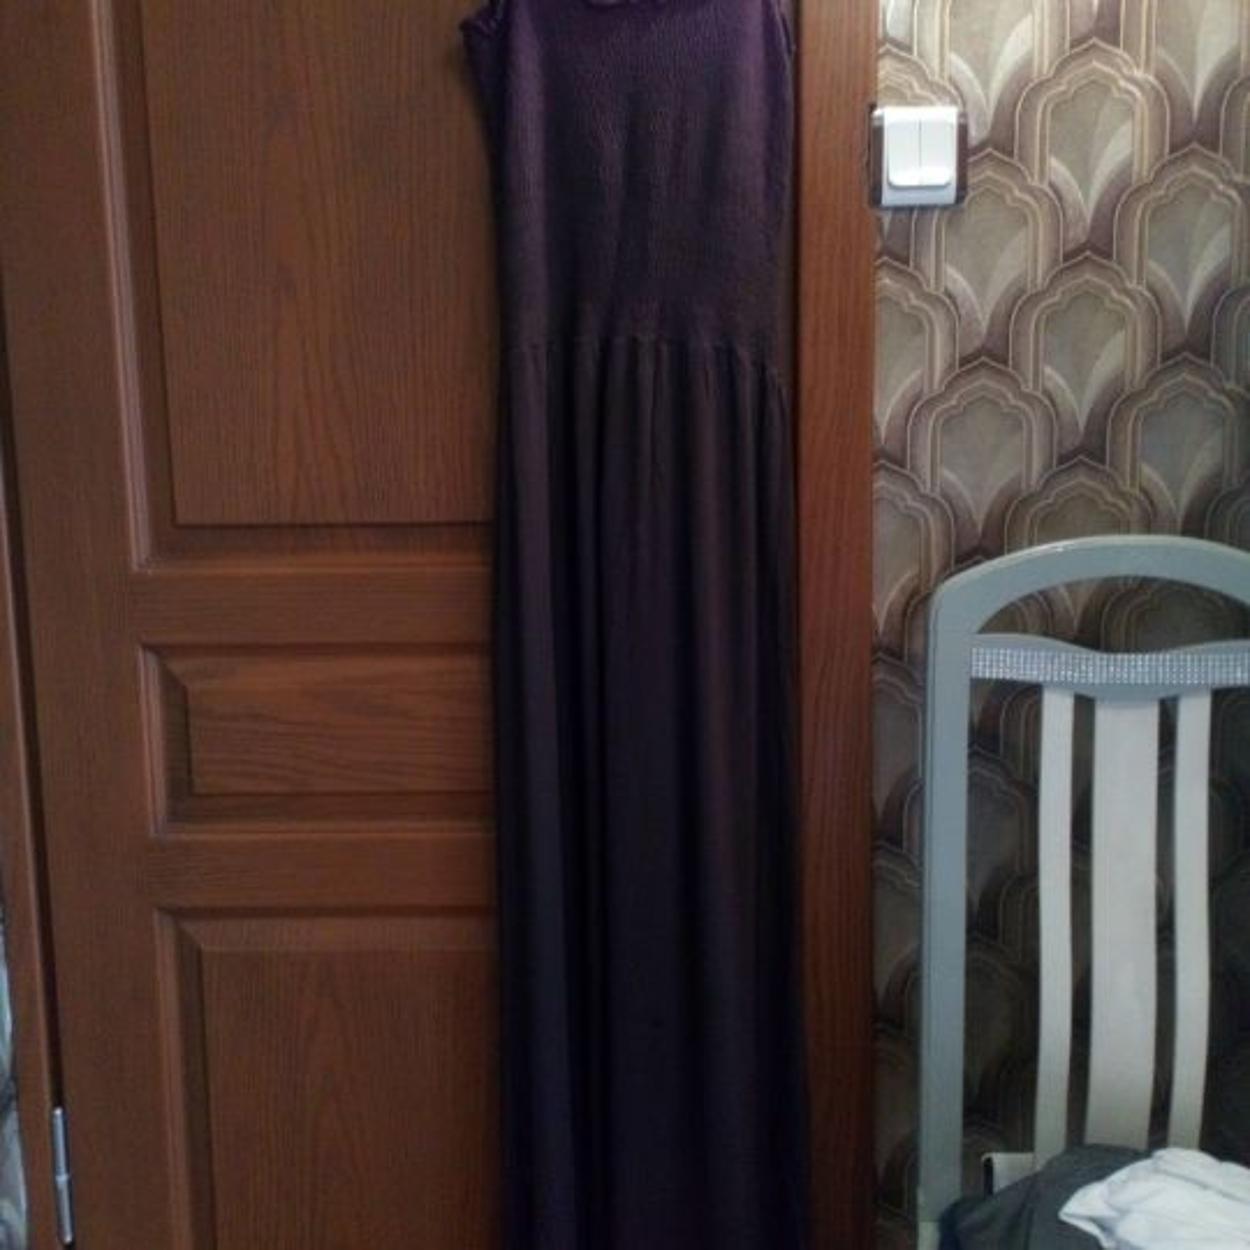 7 For All Mankind Günlük elbise